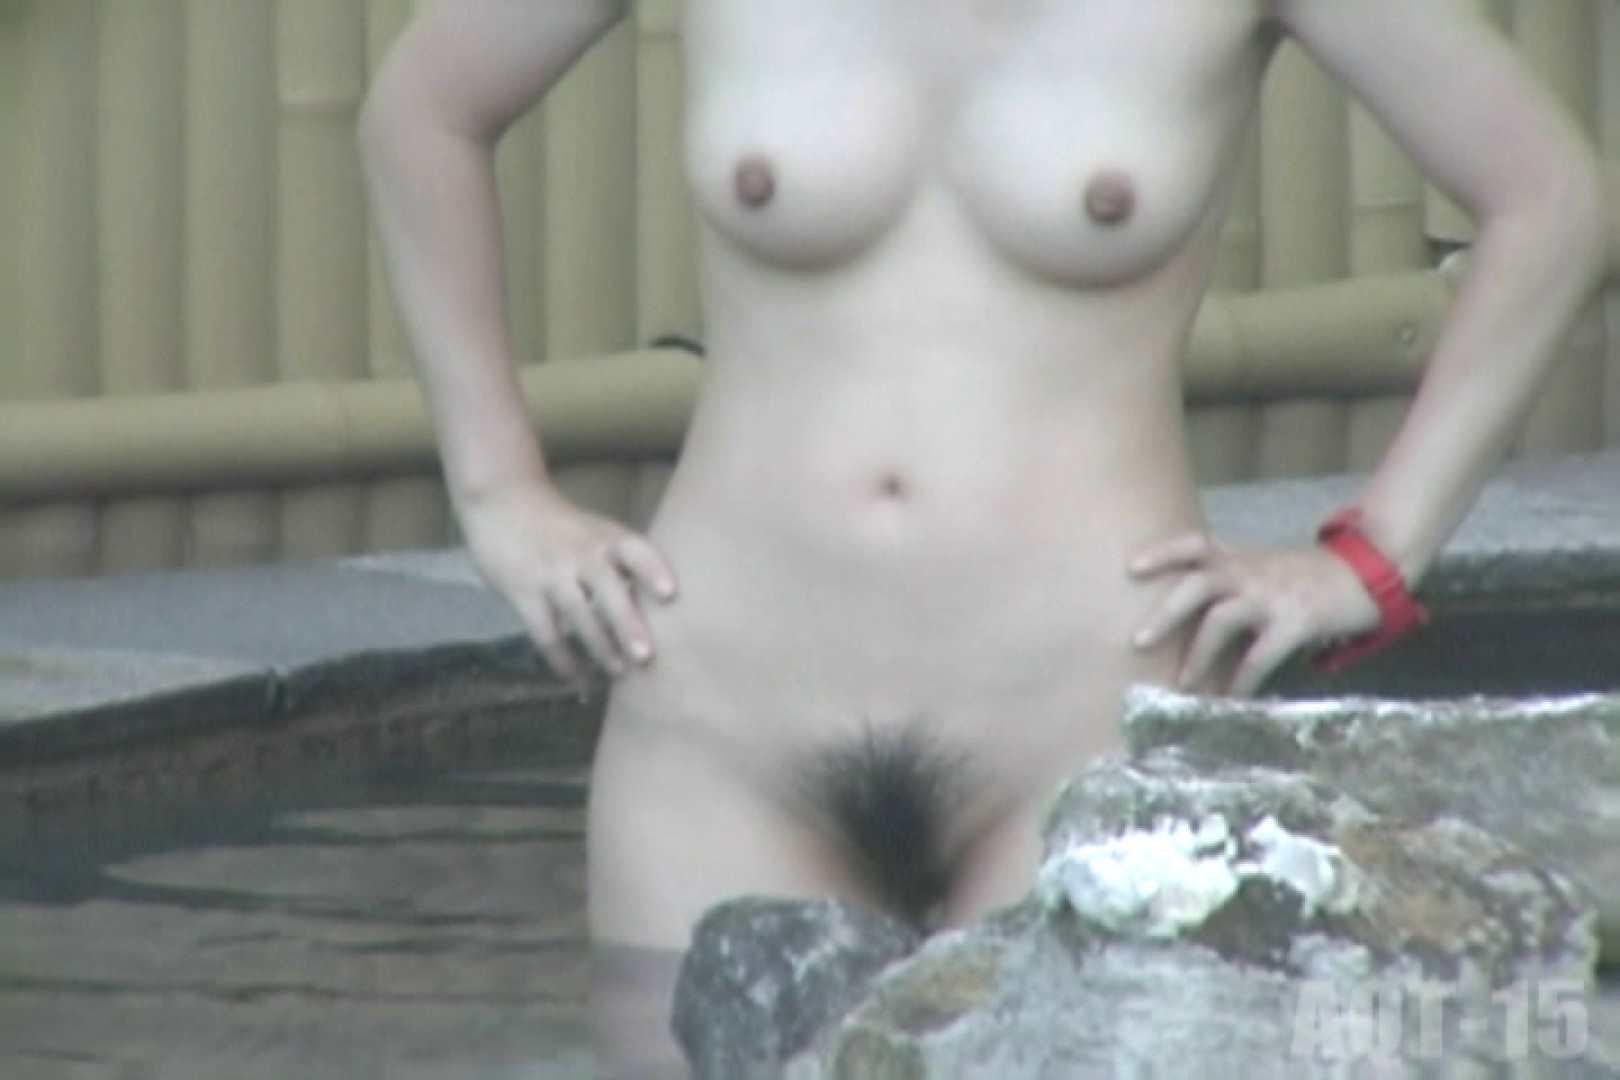 Aquaな露天風呂Vol.831 綺麗なOLたち セックス画像 75枚 74